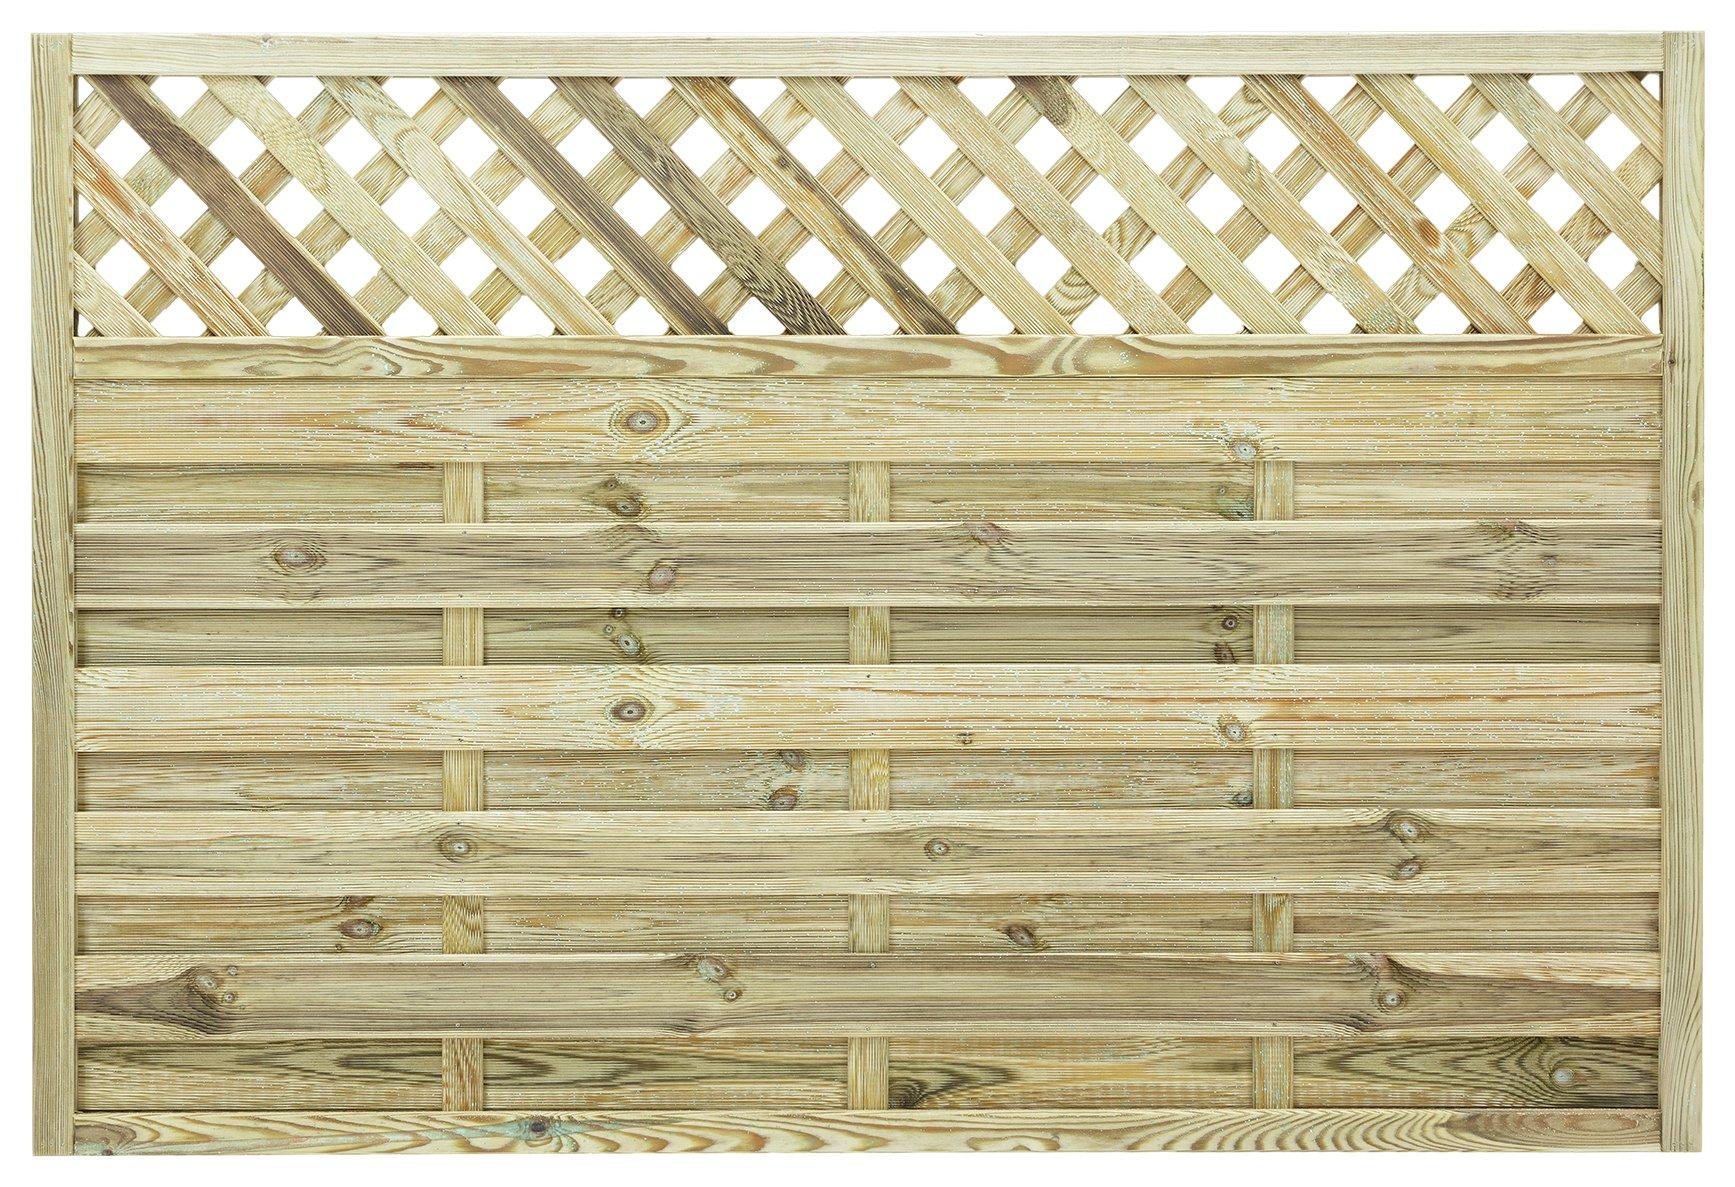 Grange - Elite St Malo 12m Fence Panel - Pack of 4 lowest price